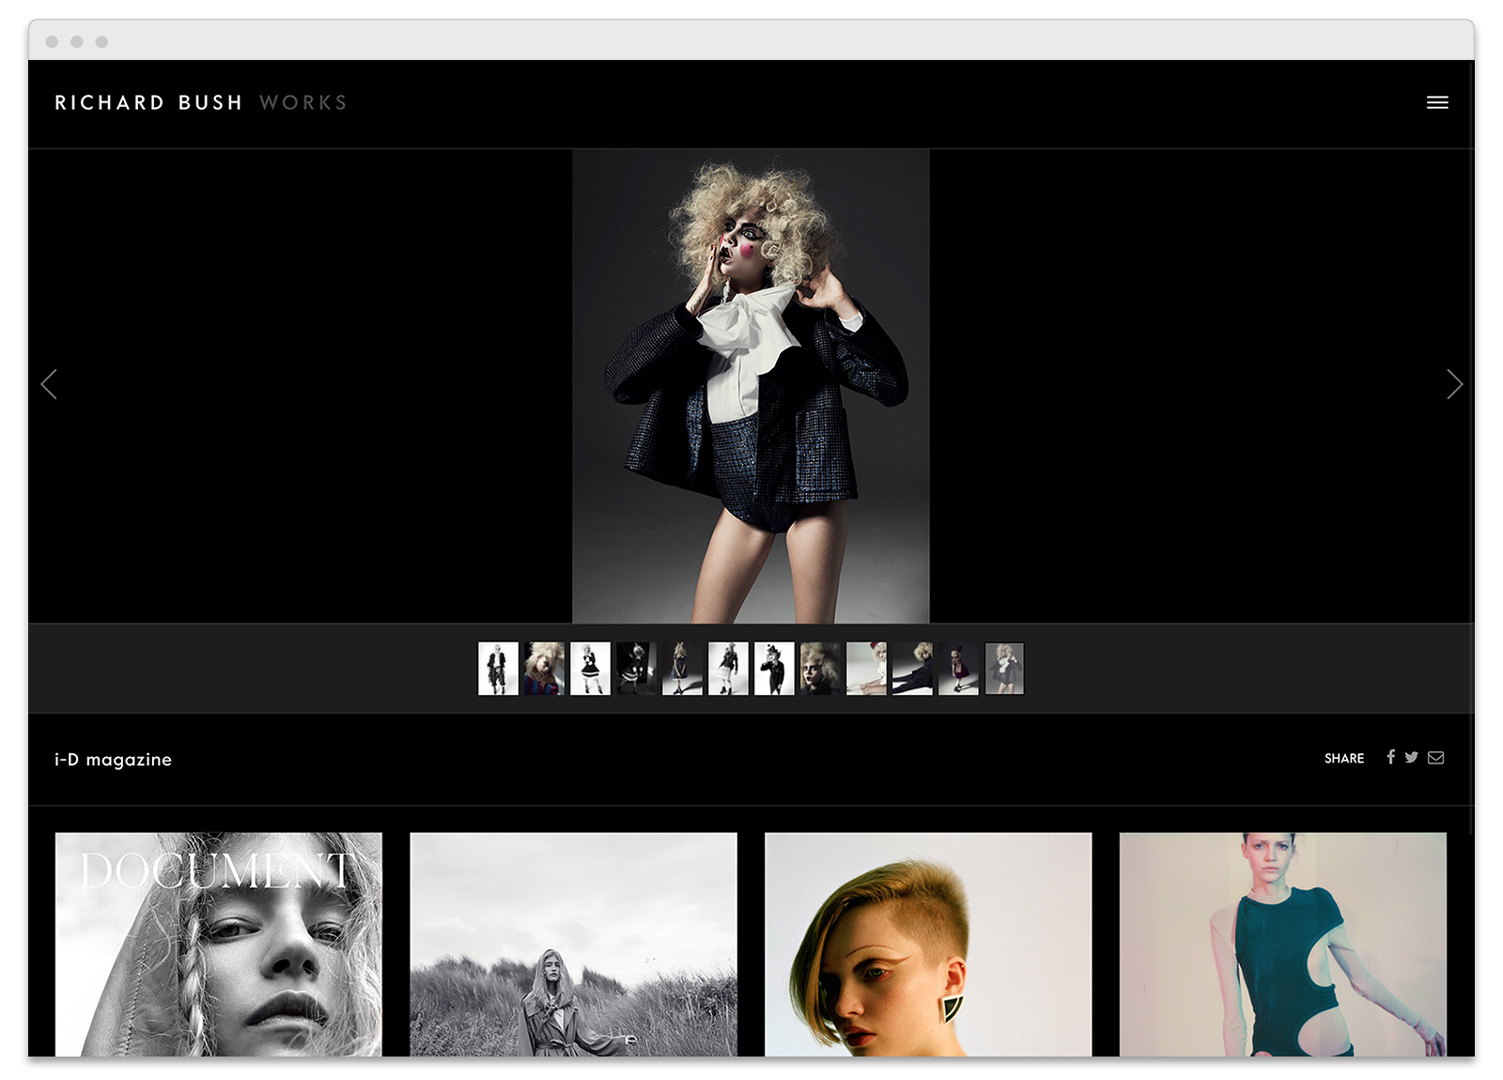 RichardBush-Browser-view_retina_v3-copy